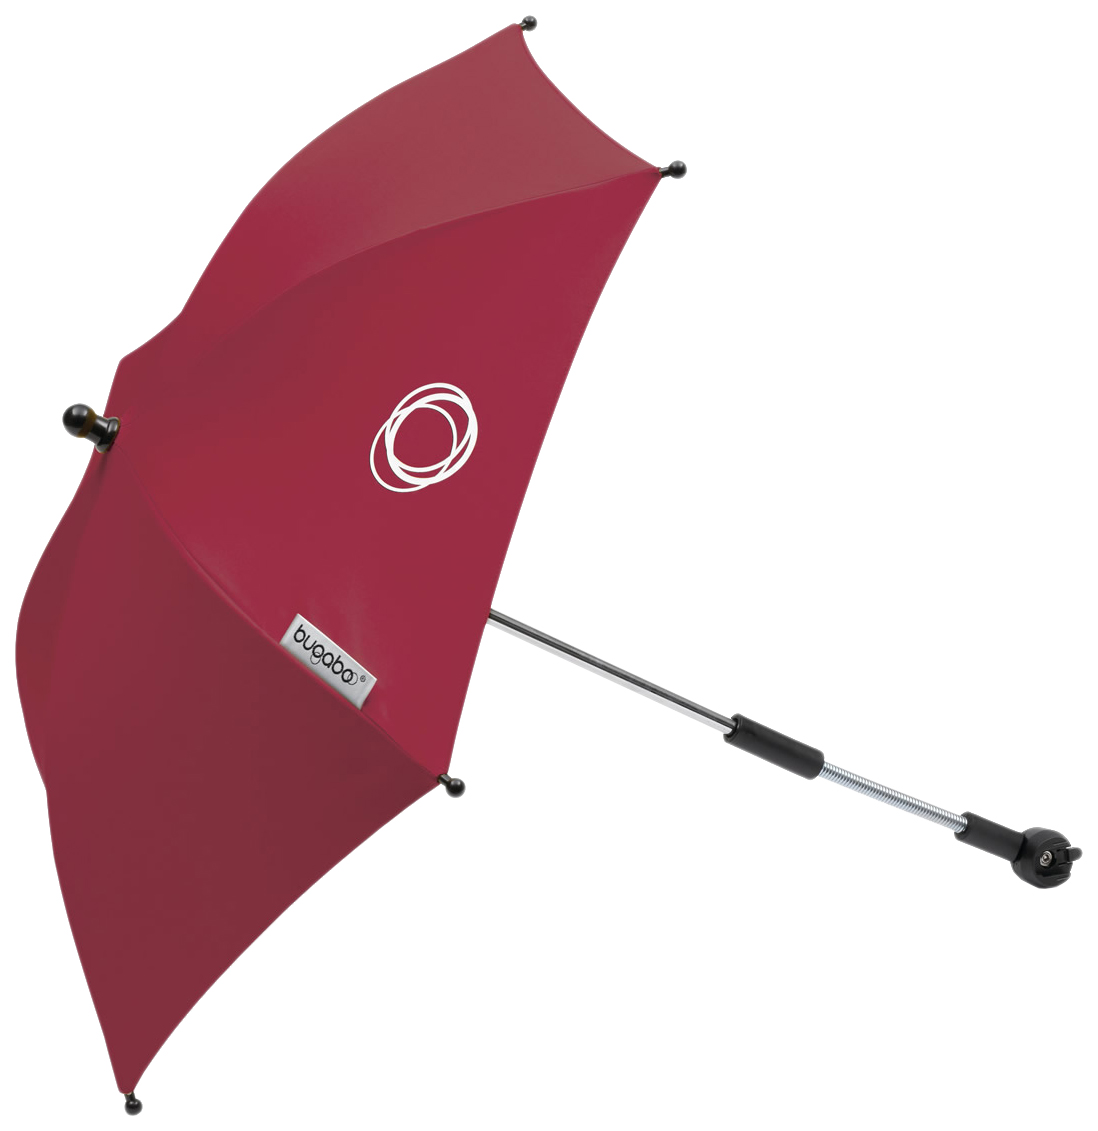 Зонтик от солнца для коляски Bugaboo+ (Бугабу)